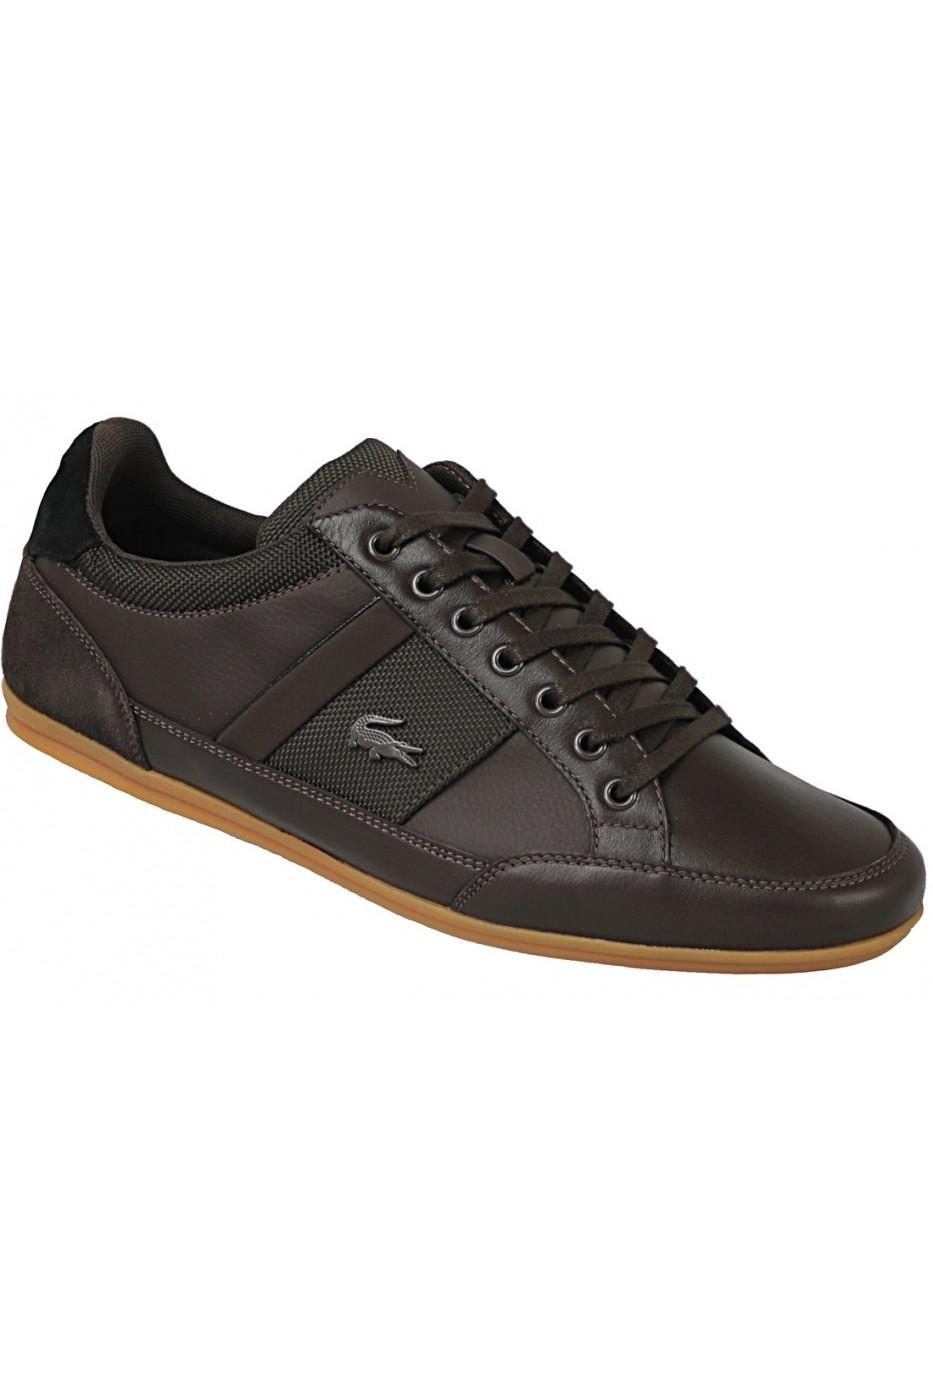 Pantofi sport pentru barbati Lacoste Chaymon 116 SPM0080257 70a404c66b